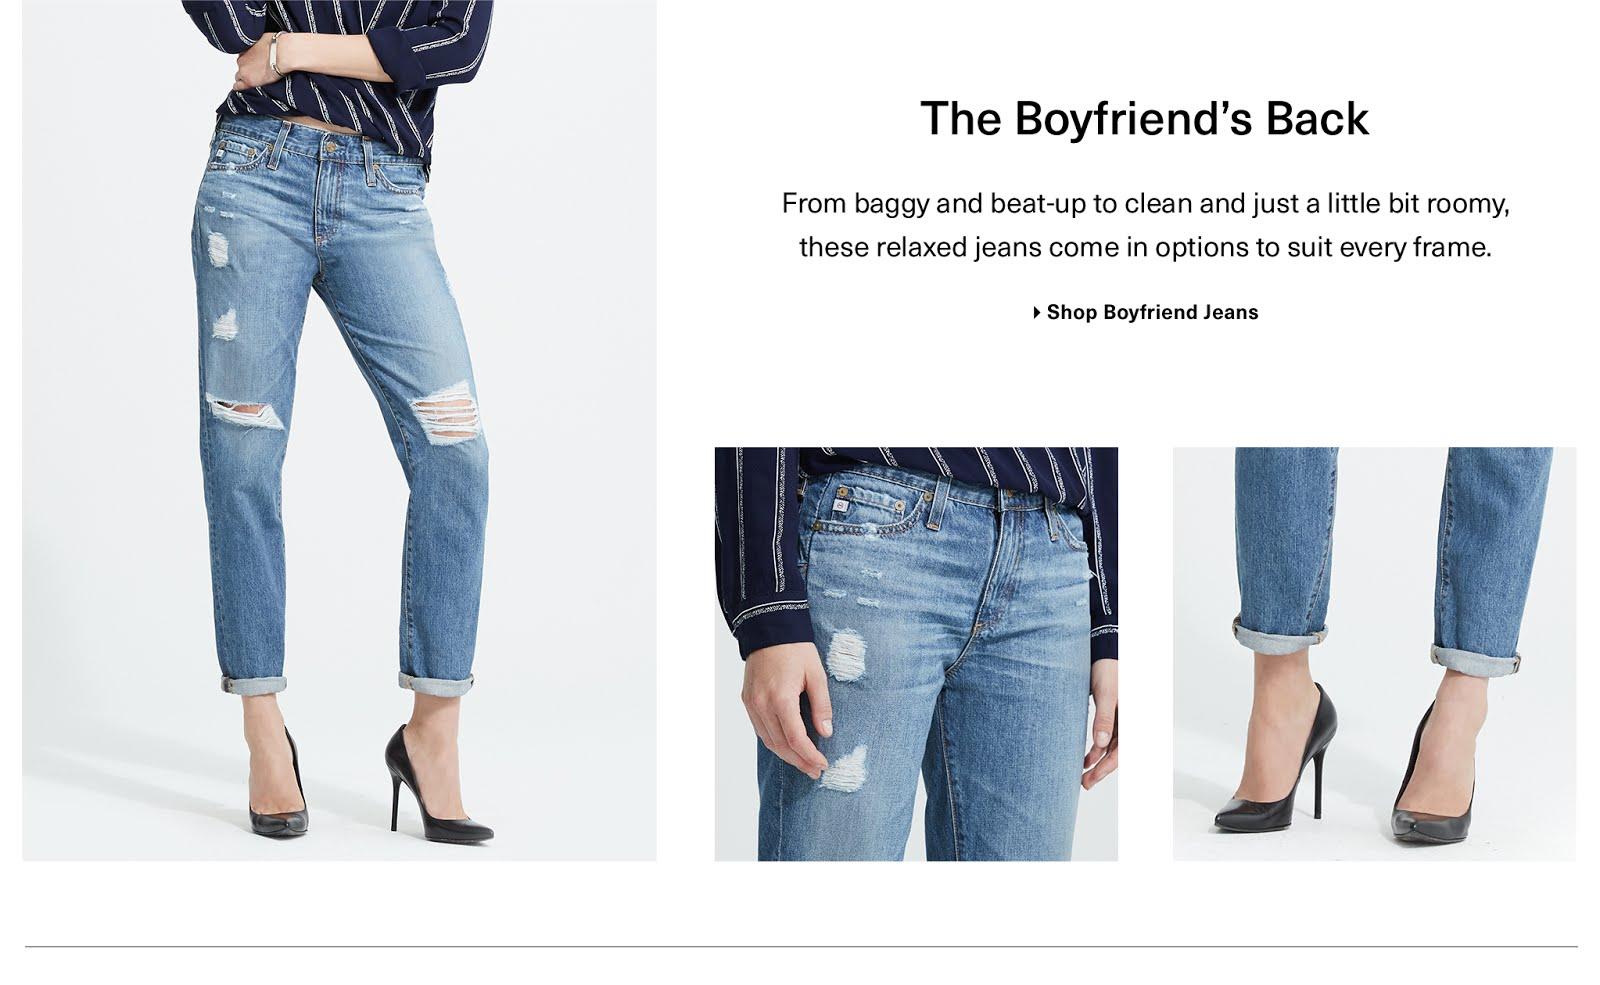 The Boyfriend's Jeans